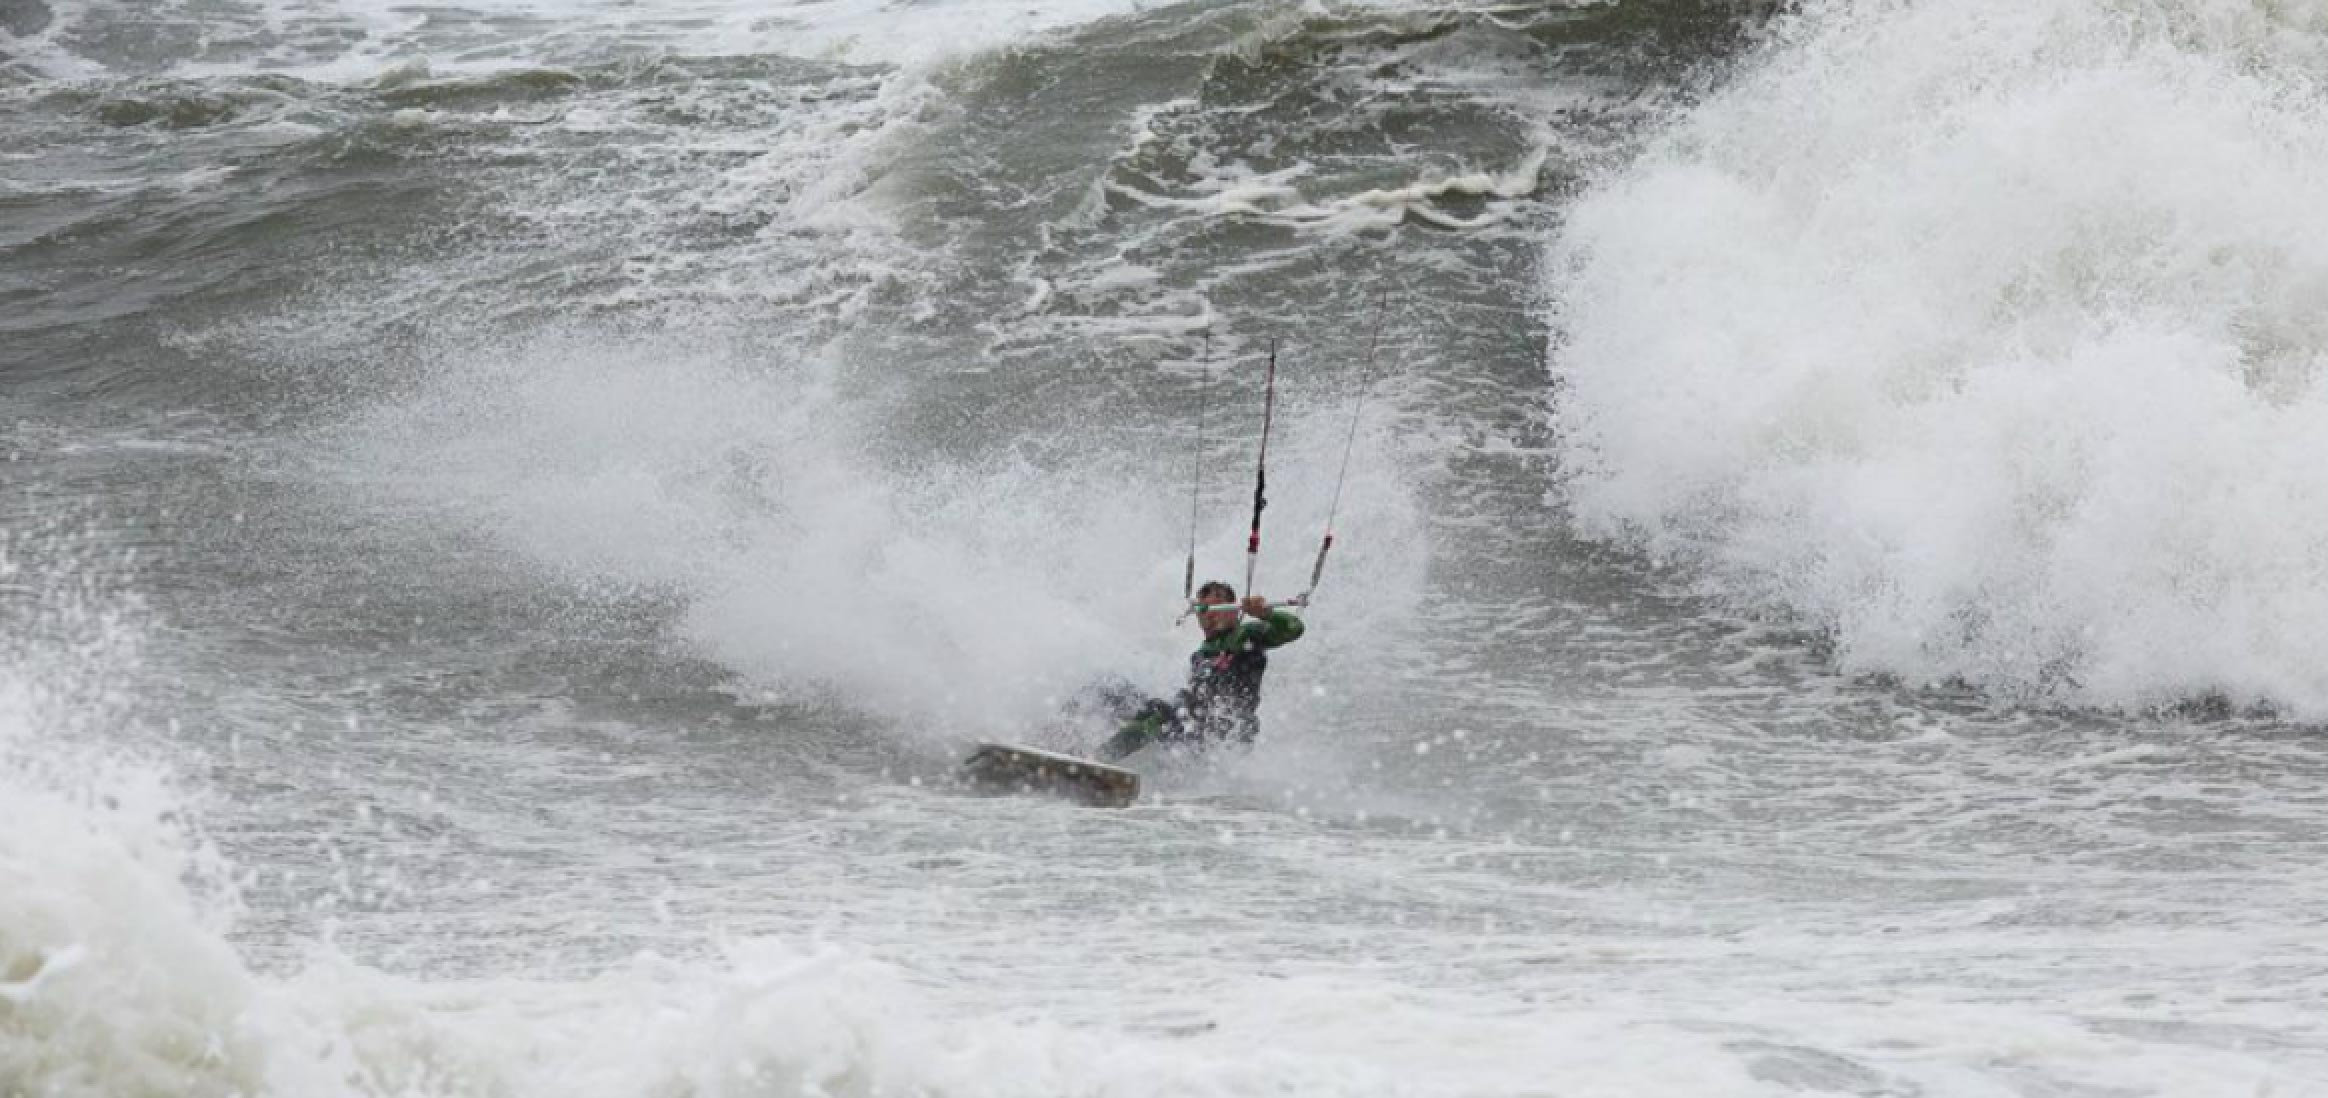 EPIC Kites - Dimitri Riding Hurricane Joaquin Swell